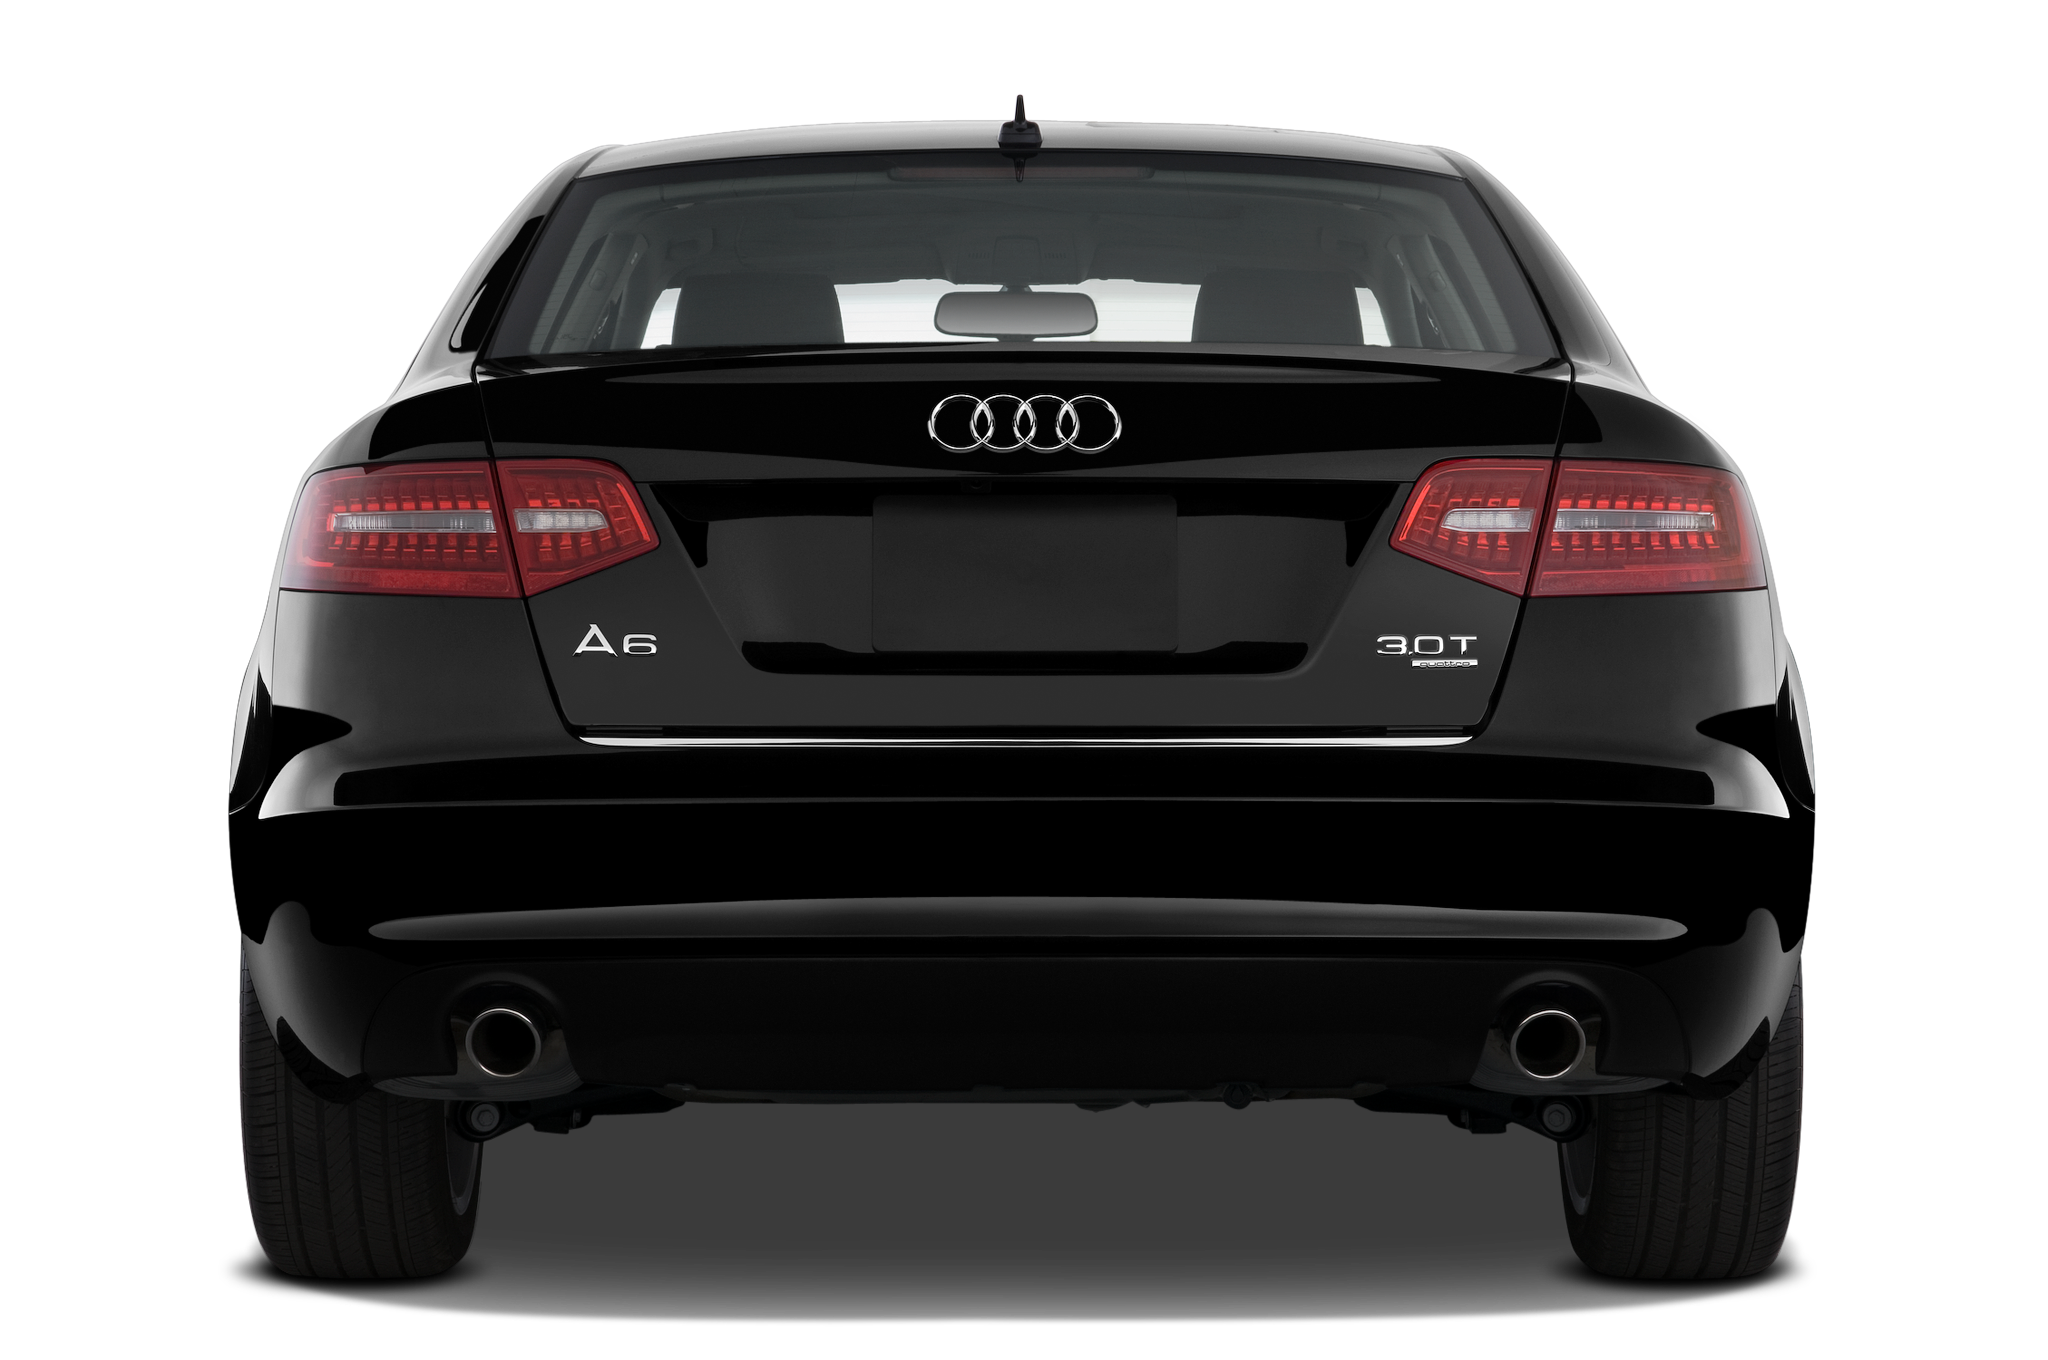 2010 audi a6 3 0 tfsi quattro audi luxury sedan review. Black Bedroom Furniture Sets. Home Design Ideas